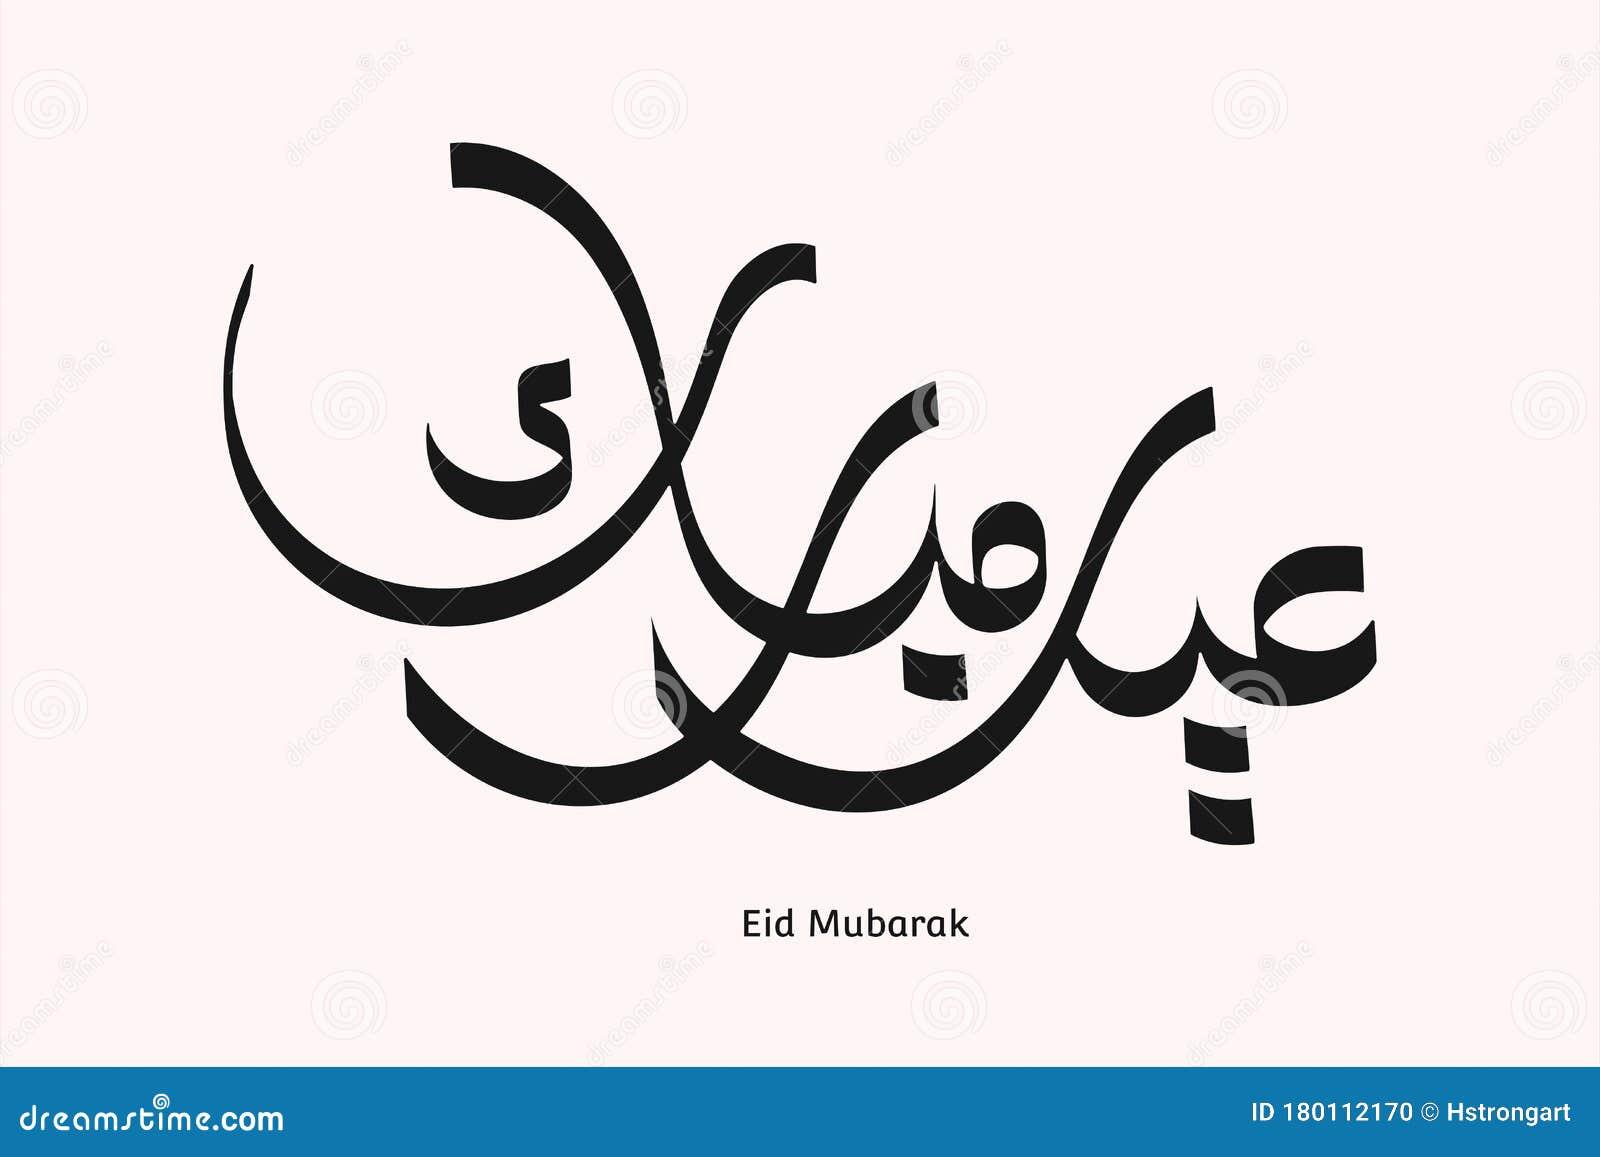 Artistic Eid Mubarak Calligraphy Stock Vector Illustration Of Festive Muslim 180112170